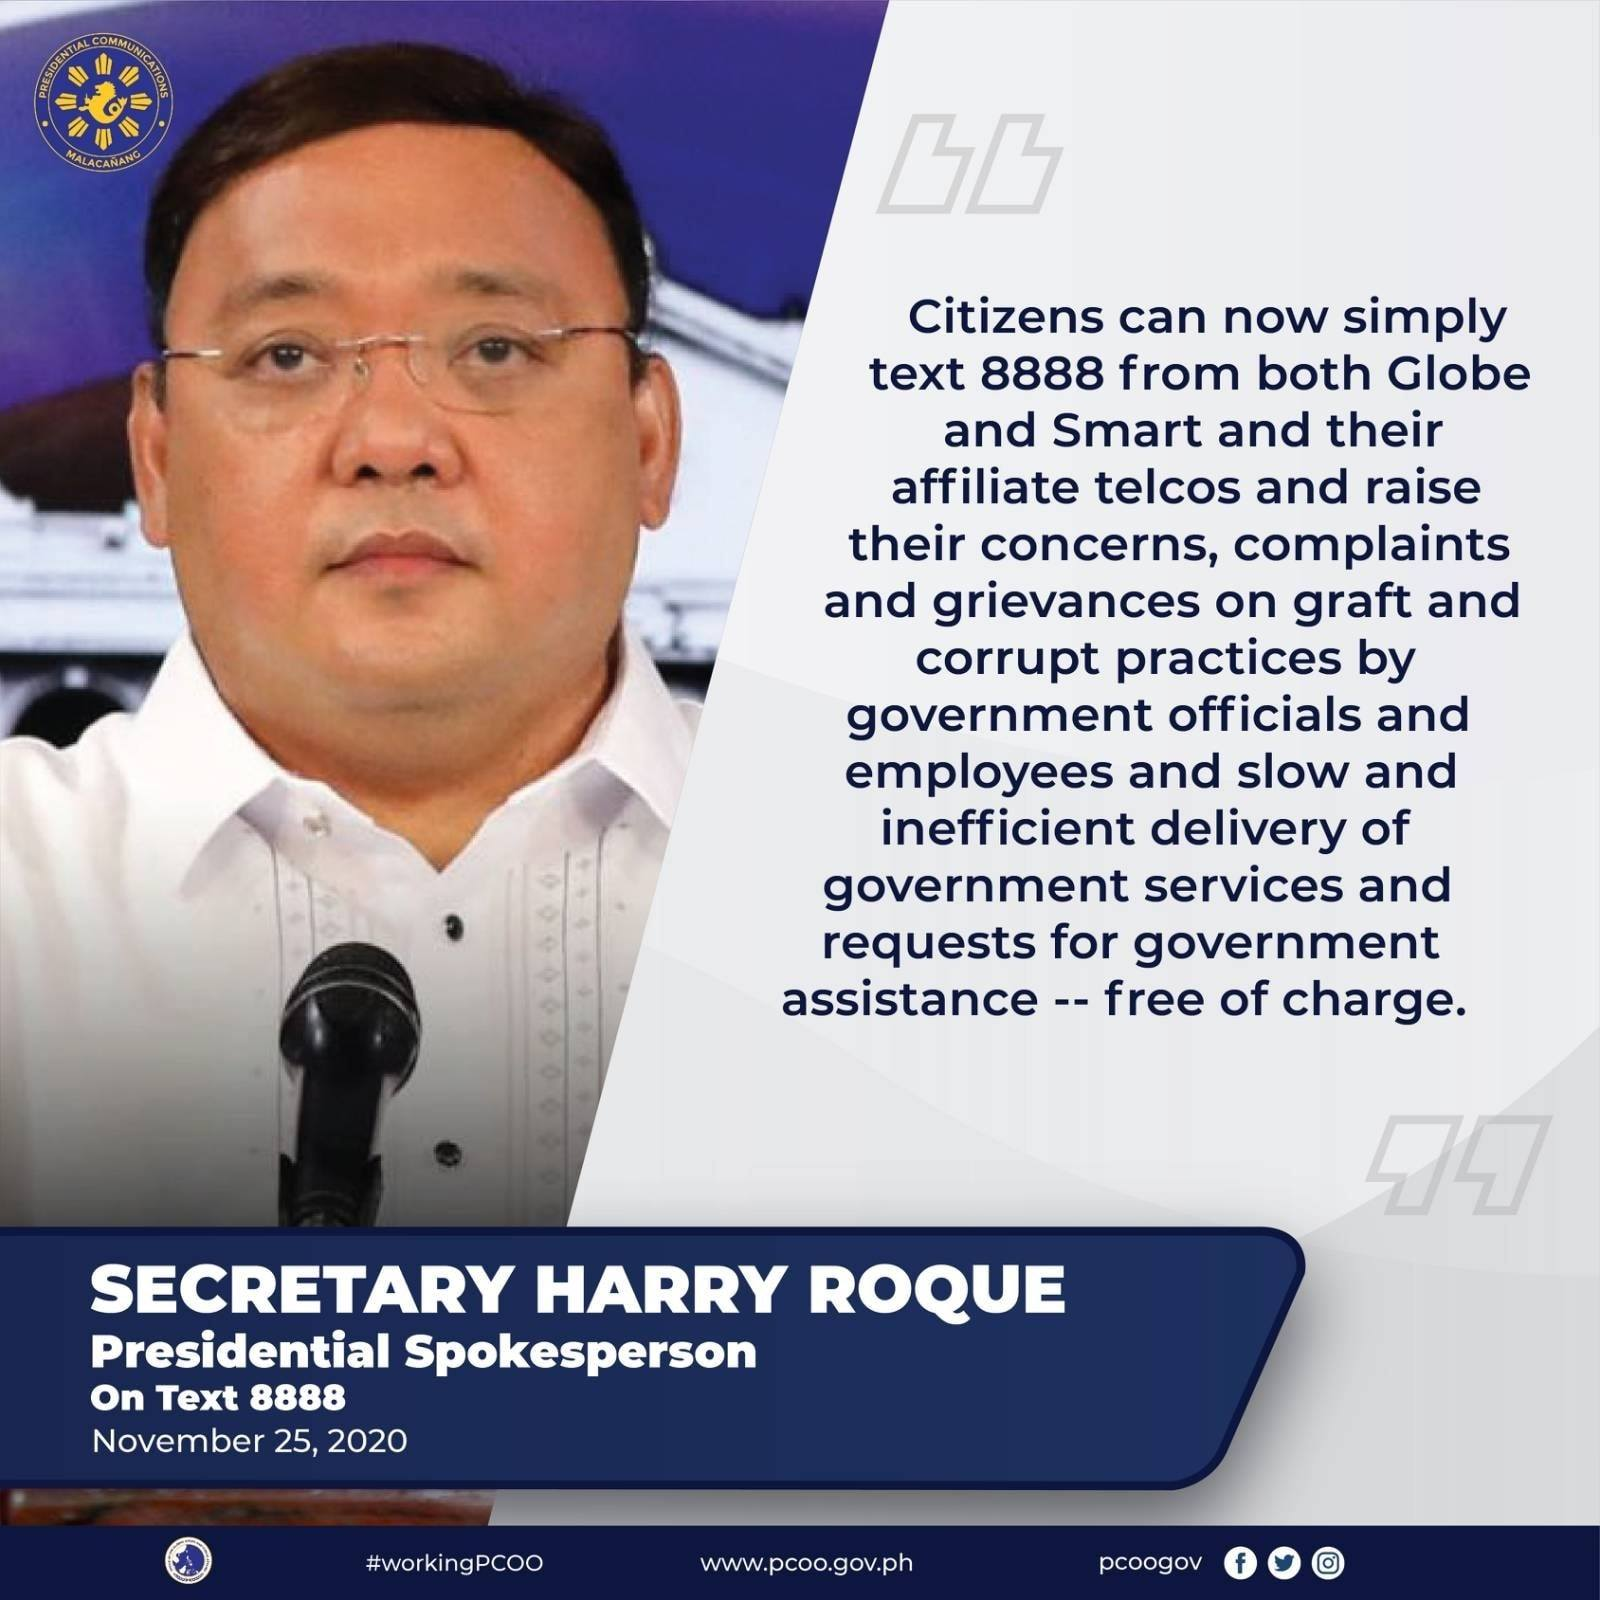 Statement of Presidential Spokesperson Secretary Harry Roque on Text 8888